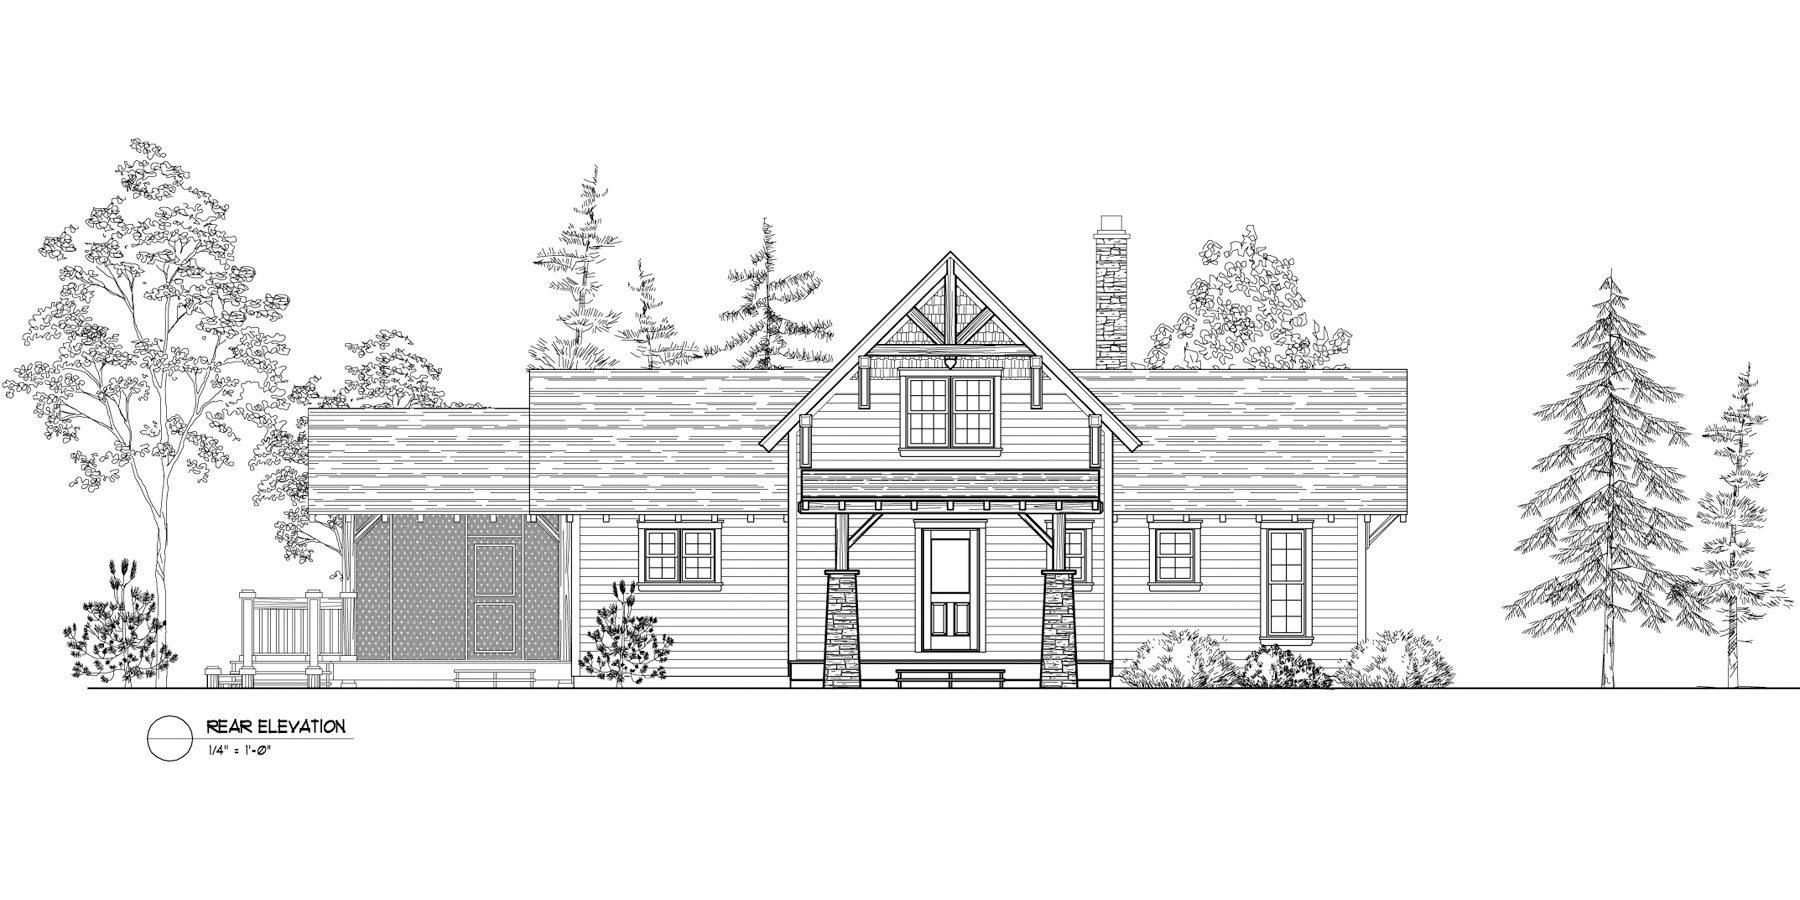 Normerica Timber Frames, House Plan, The Lanark 3522, Rear Elevation